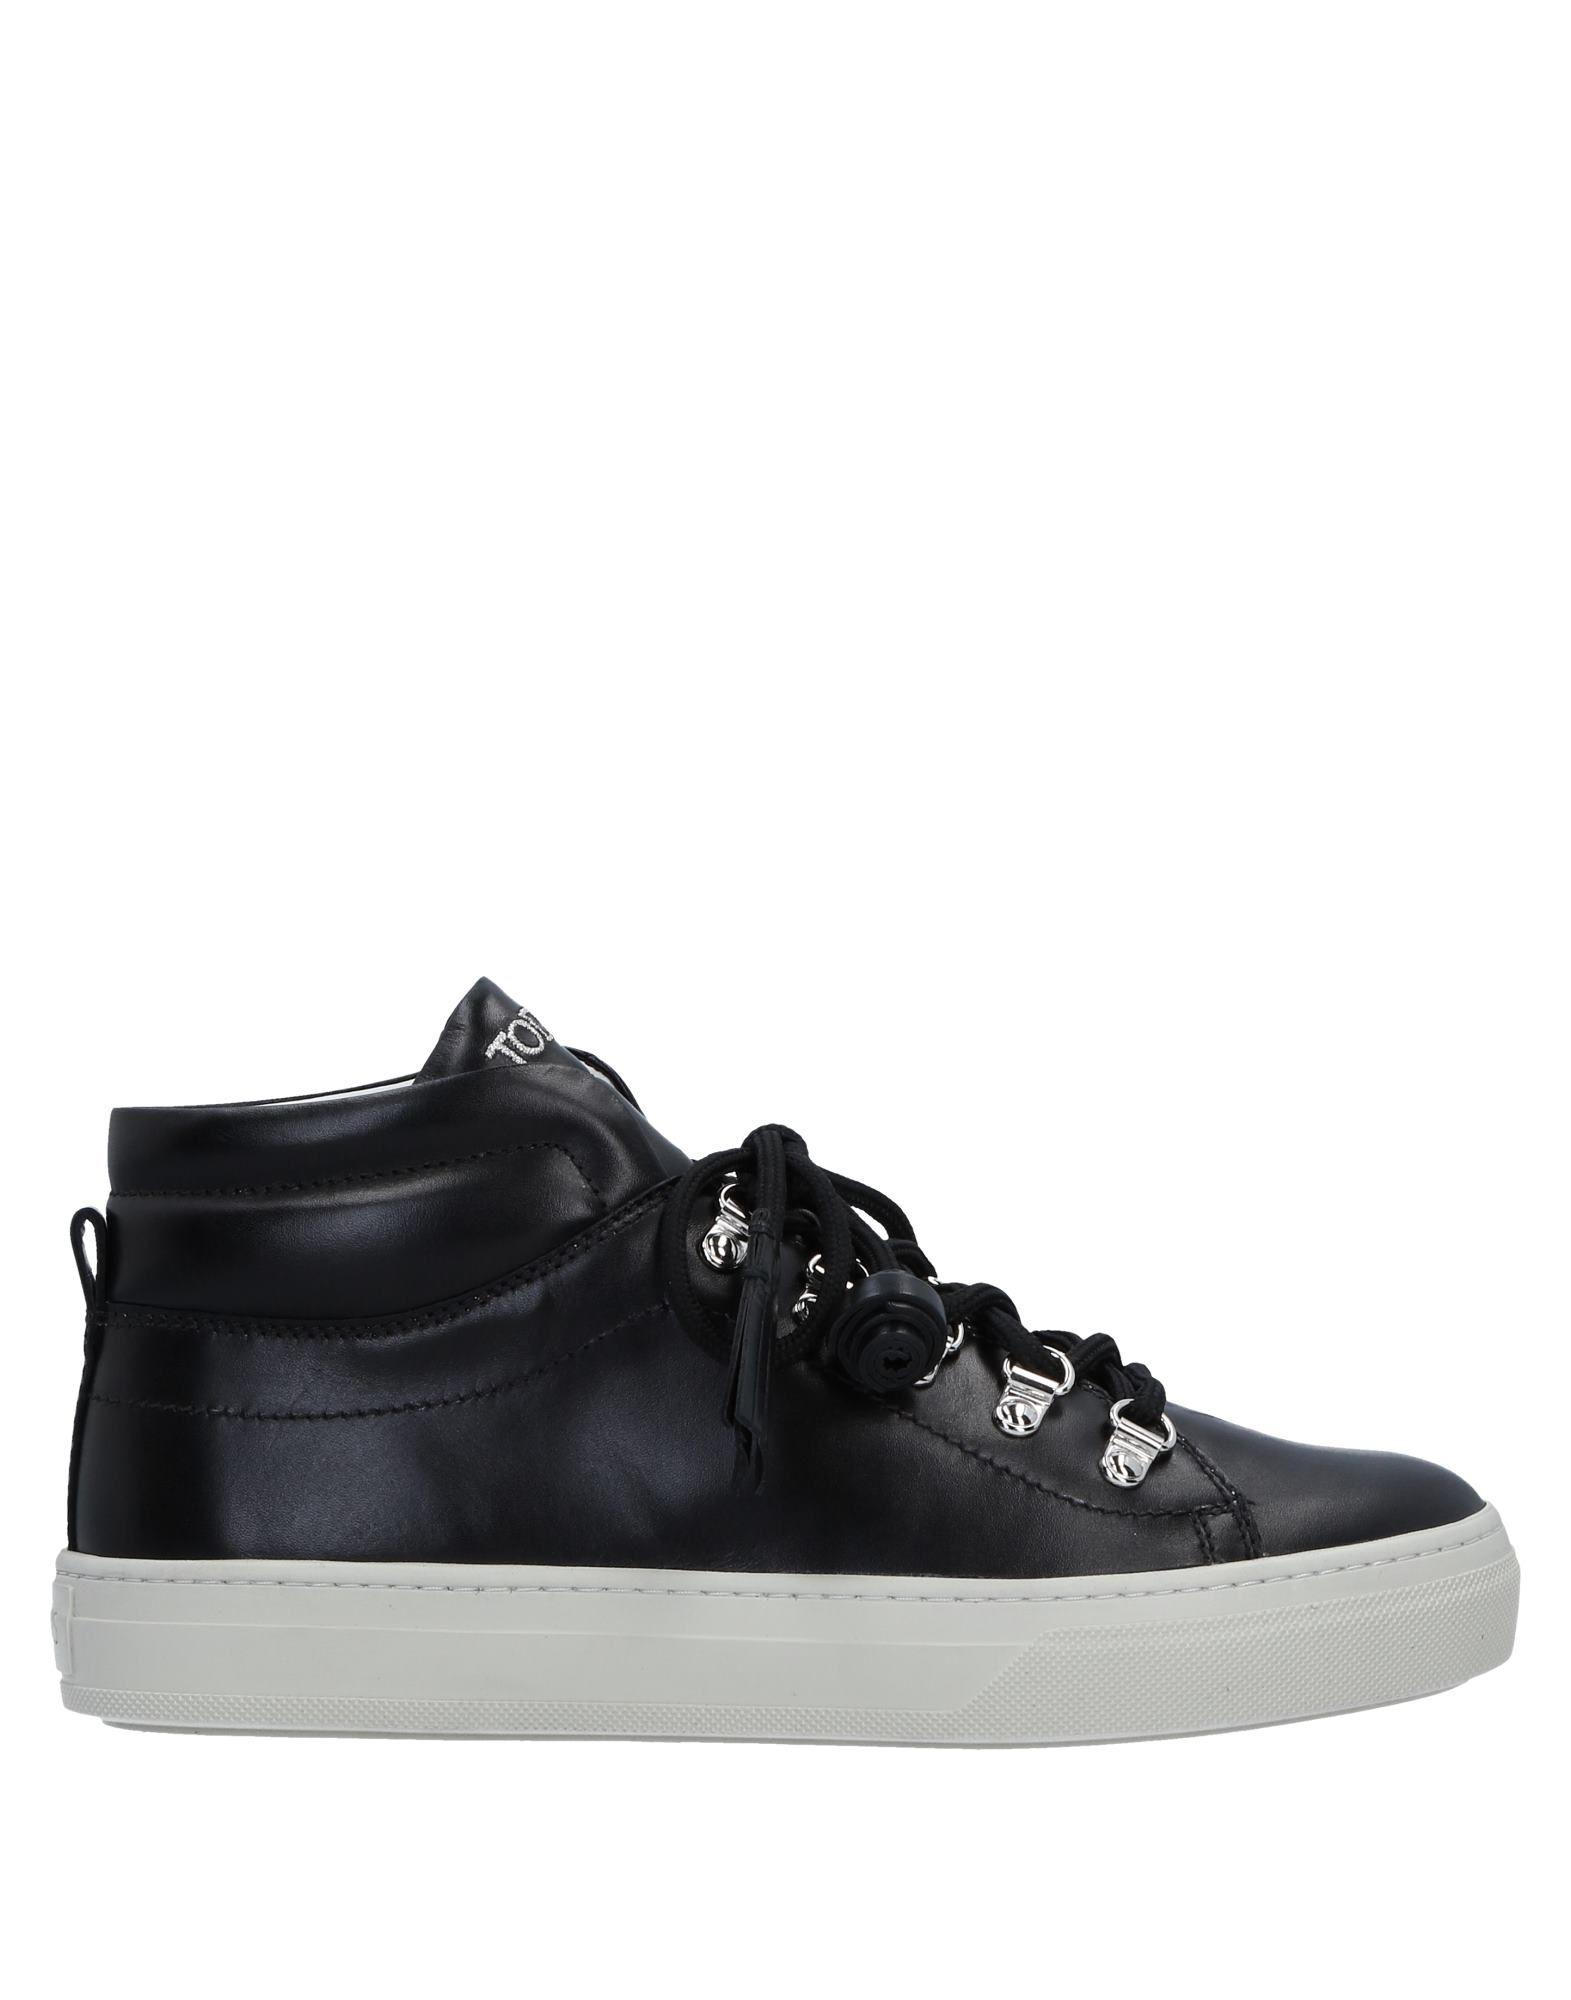 Tod's Sneakers Damen  11542242BIGünstige gut aussehende Schuhe